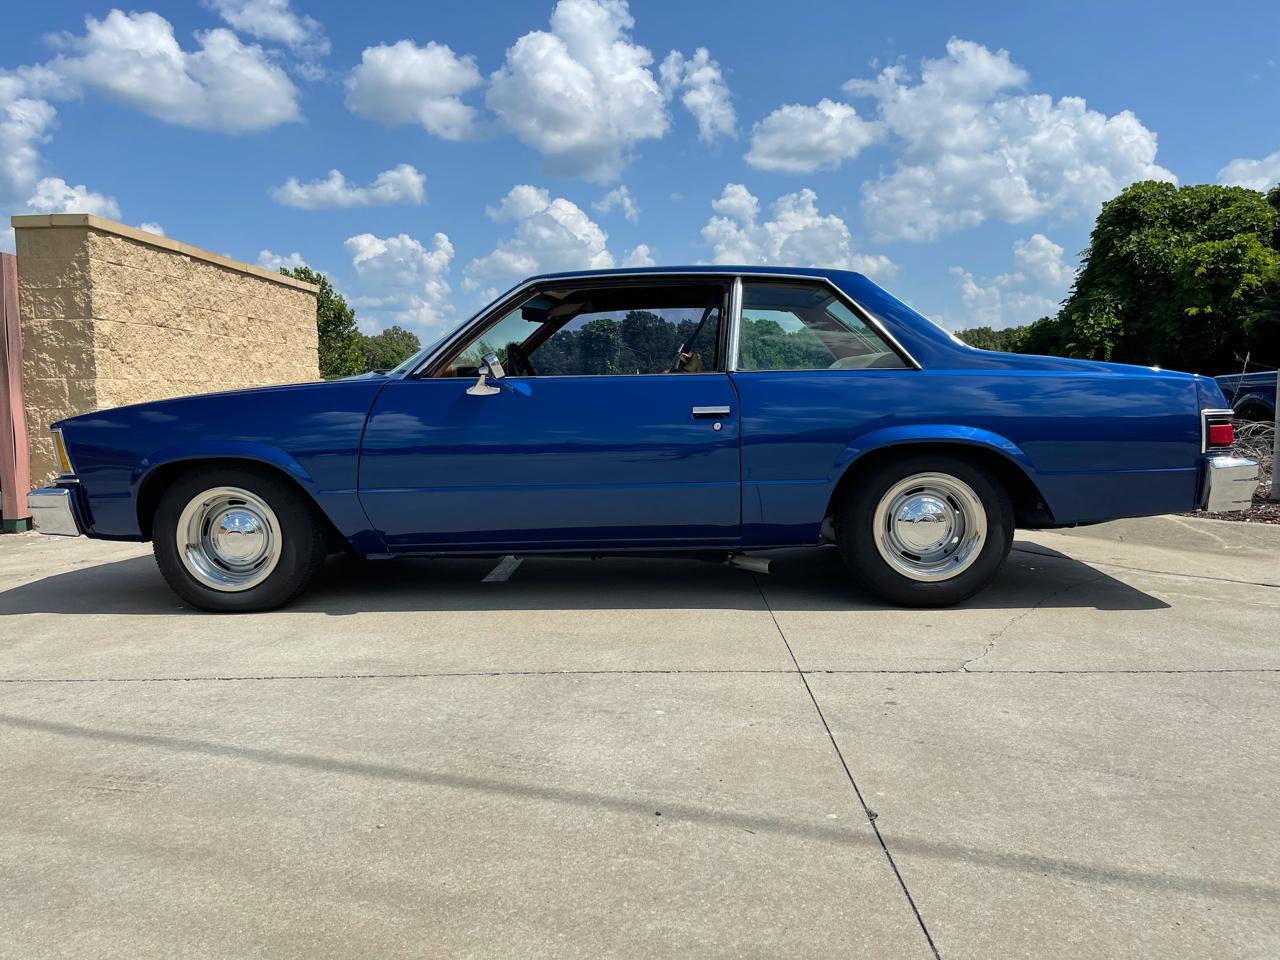 Chevrolet Malibu 2dr Coupe Classic 1979